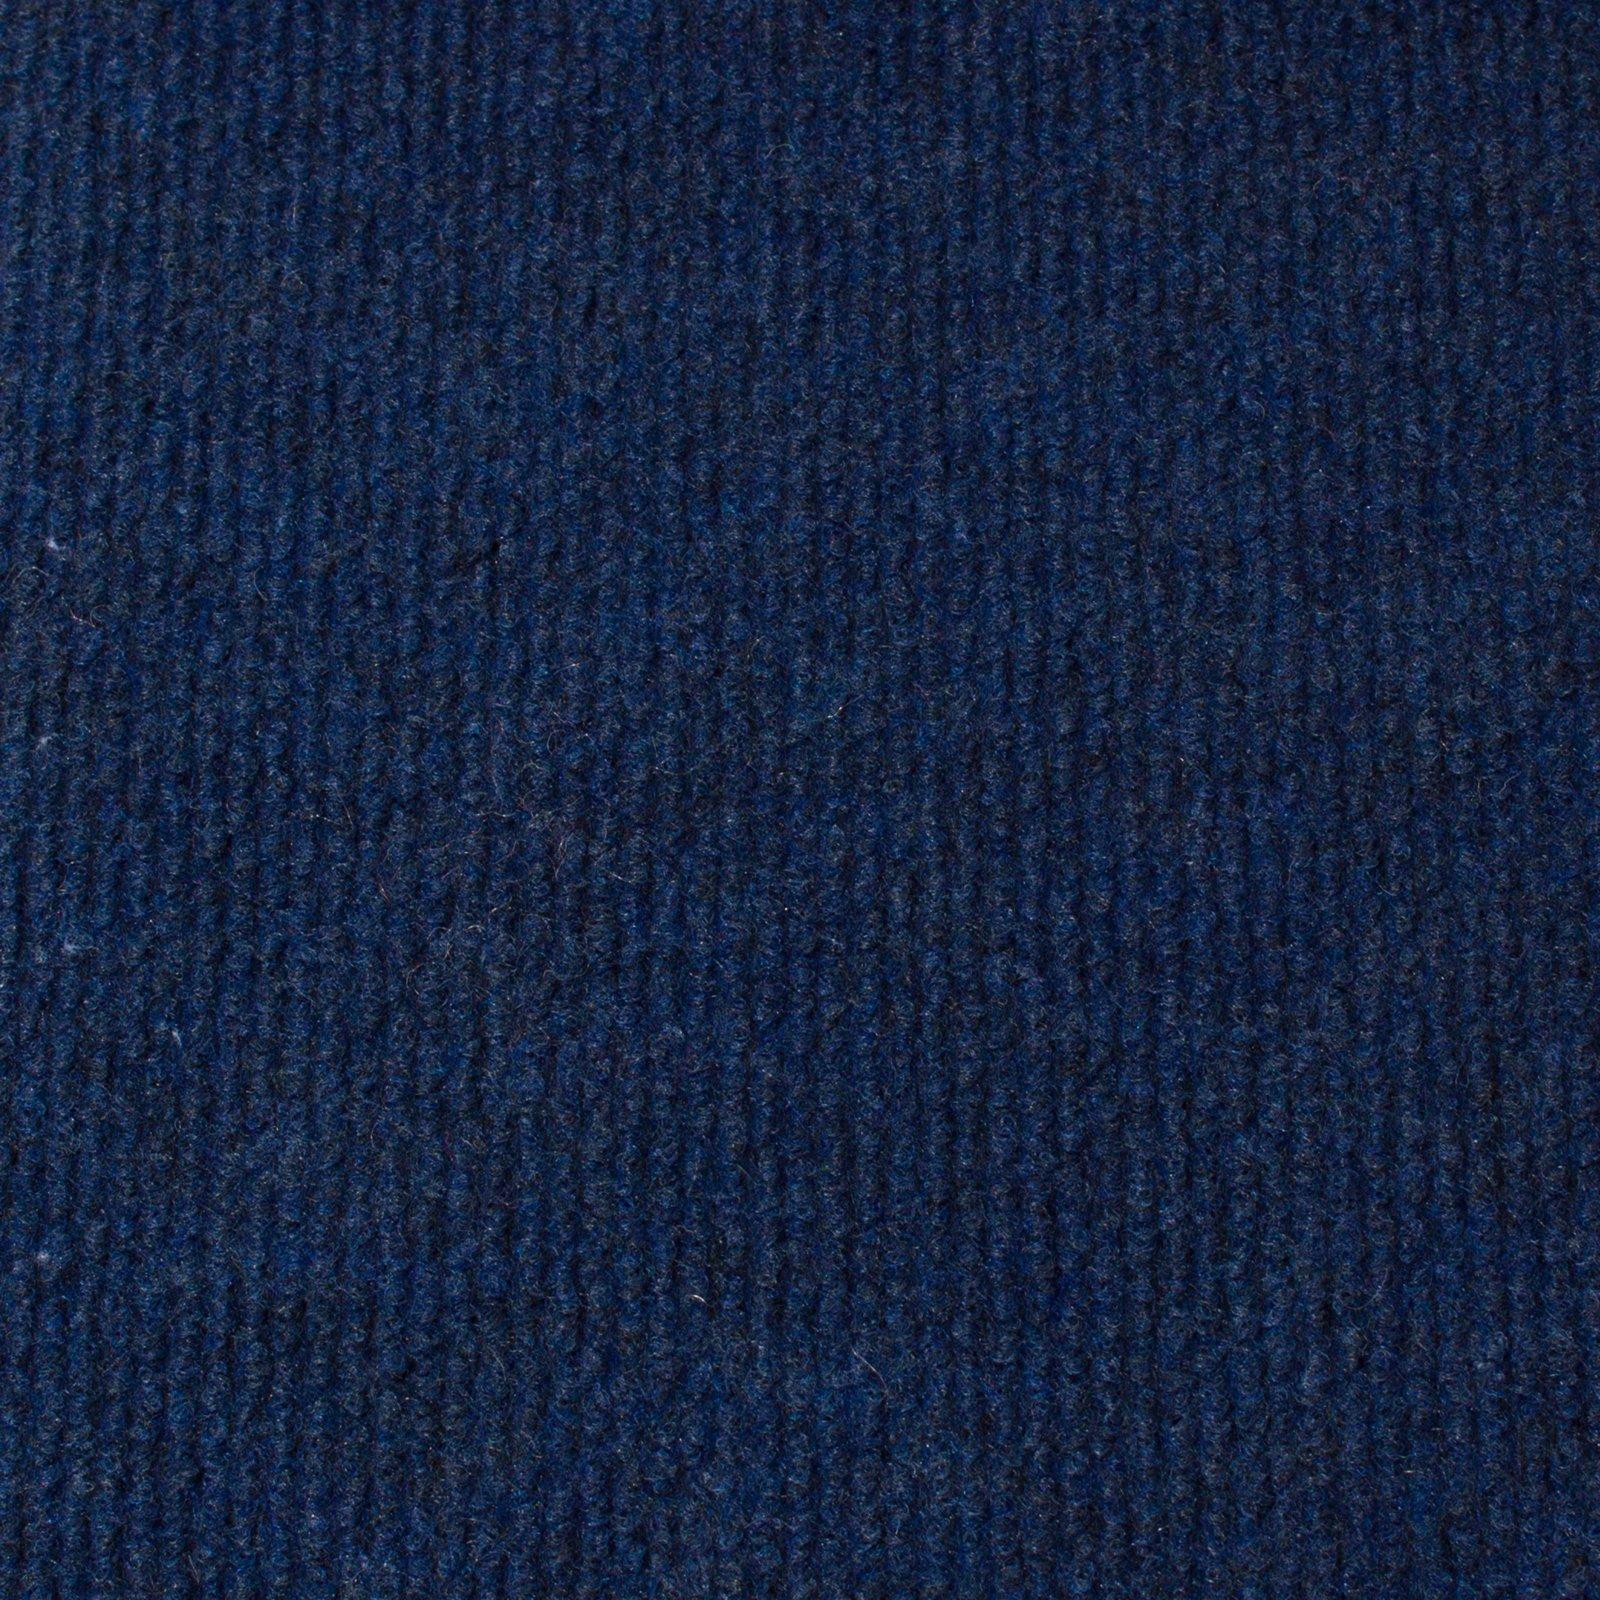 teppichboden star blau 4 meter breit teppichboden bodenbel ge baumarkt roller m belhaus. Black Bedroom Furniture Sets. Home Design Ideas